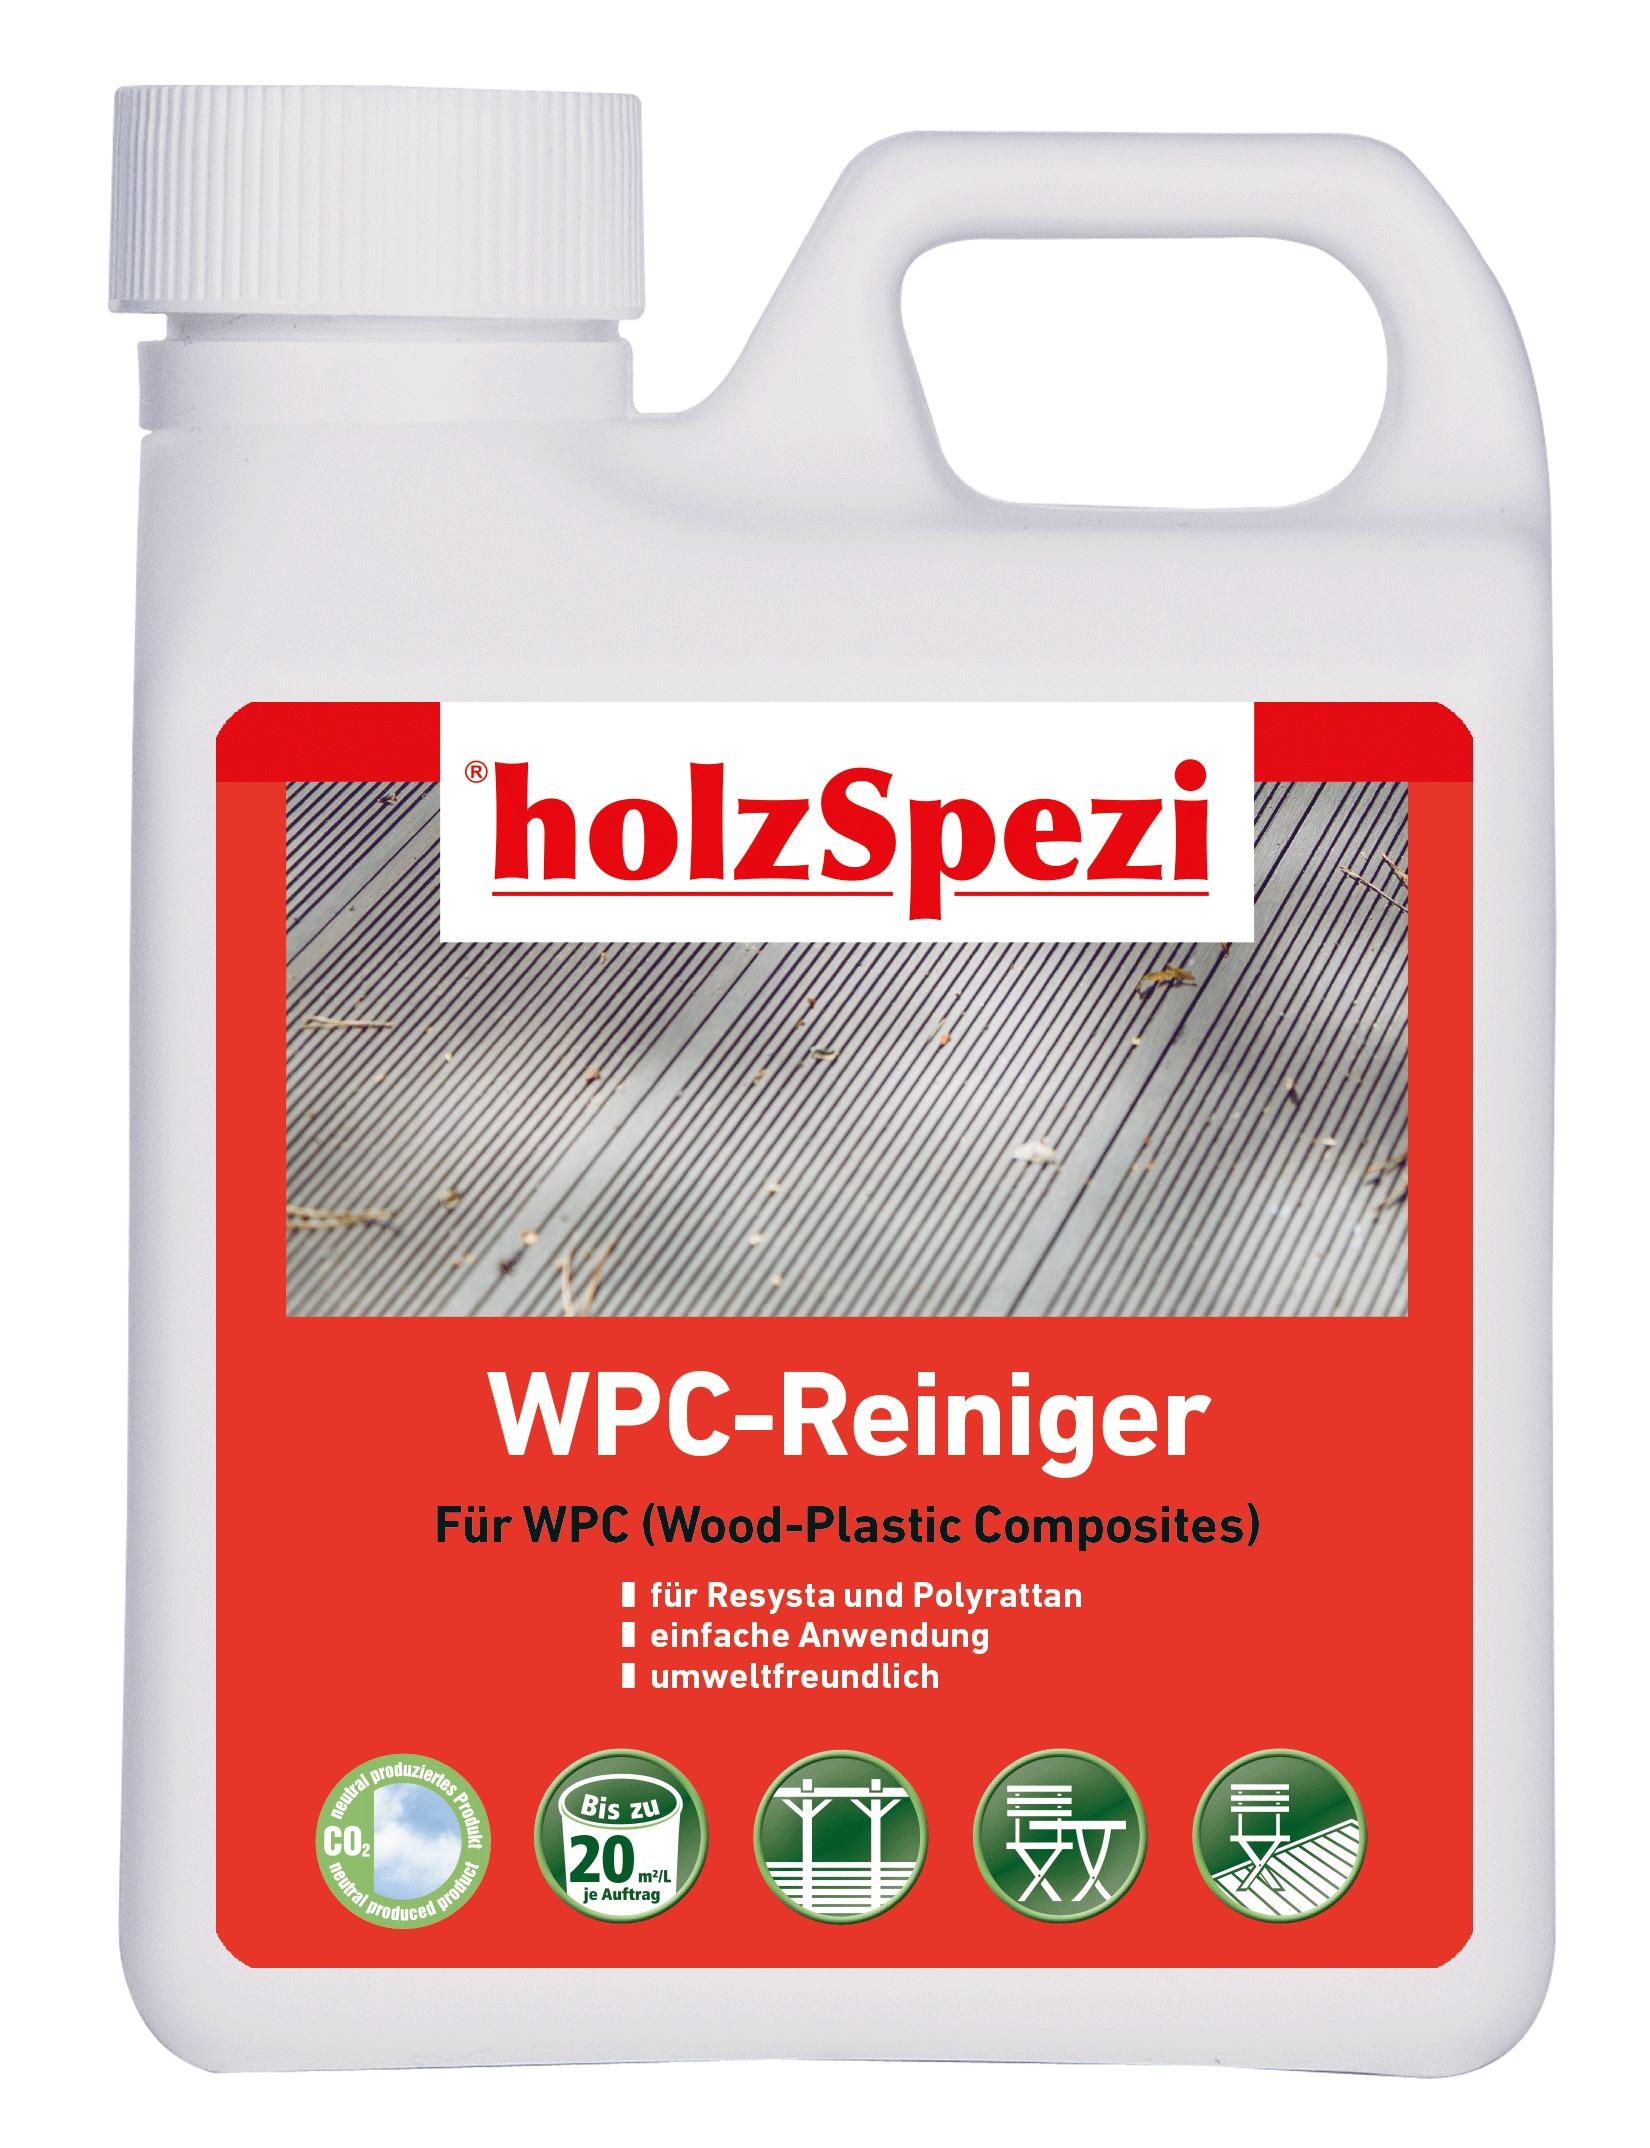 holzSpezi WPC-Reiniger